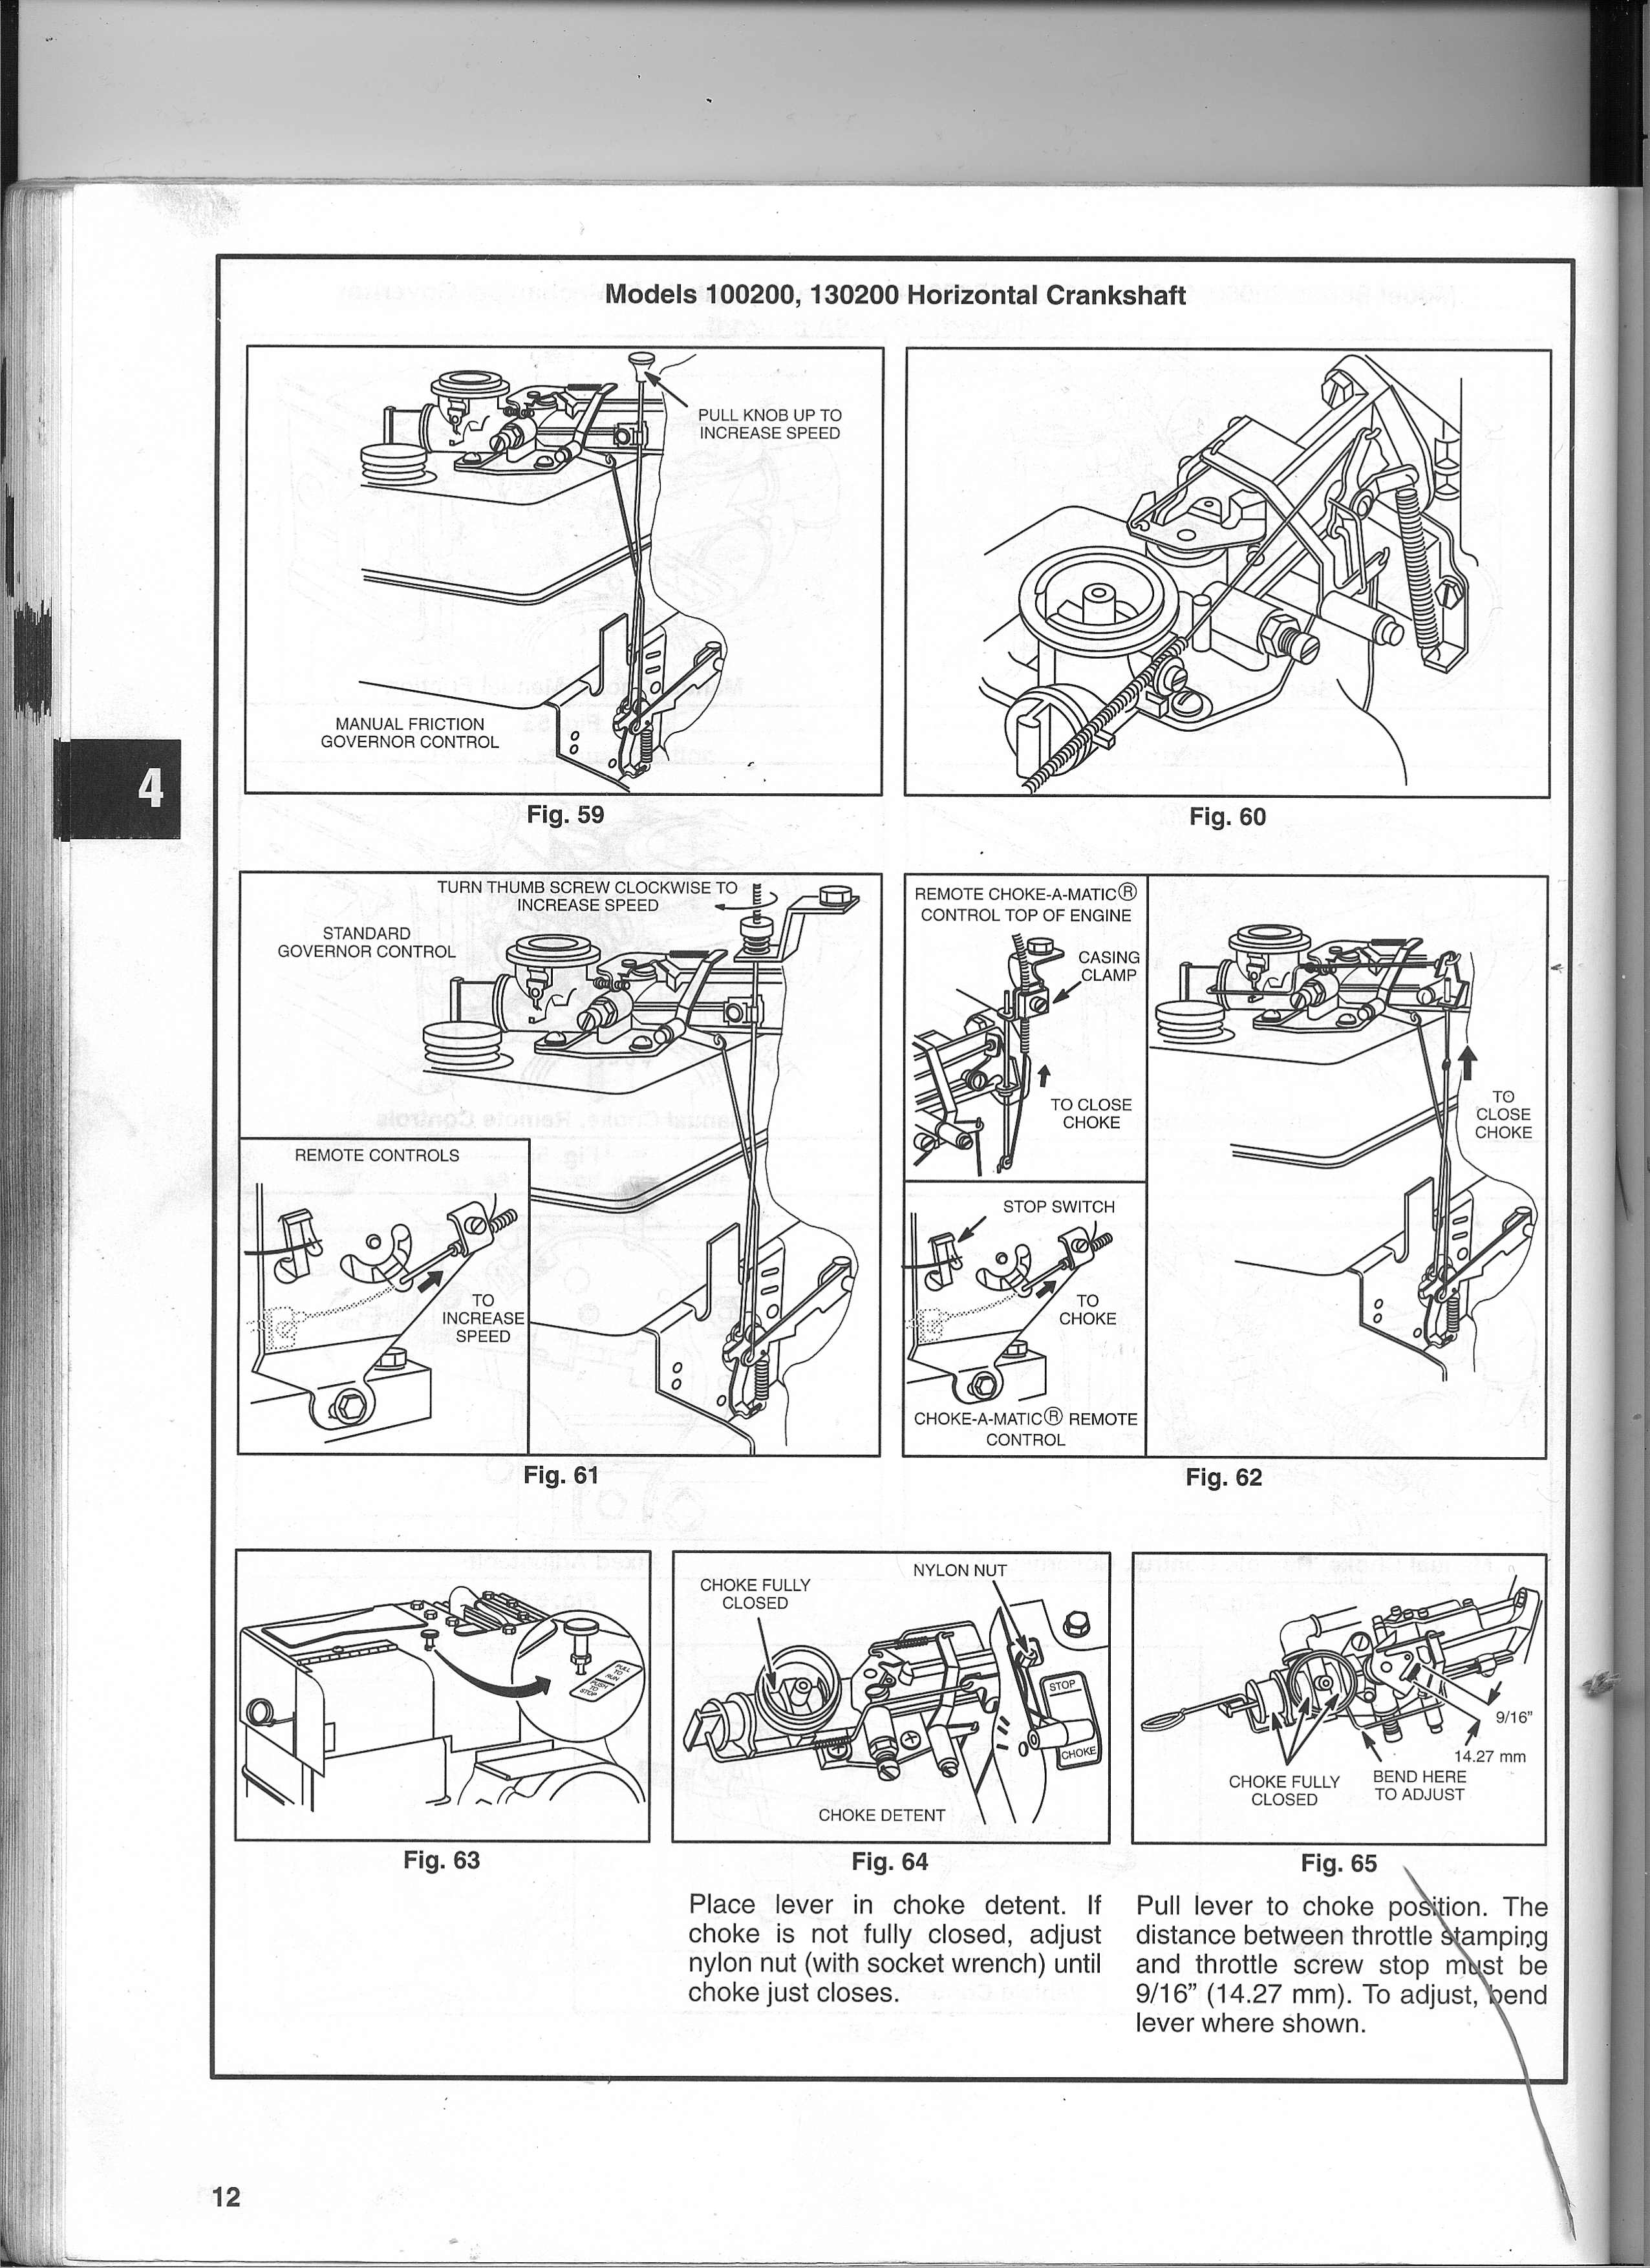 4 Hp Briggs And Stratton Carburetor Diagram Detailed Wiring Diagrams 14 Tiller Explore Schematic U2022 65